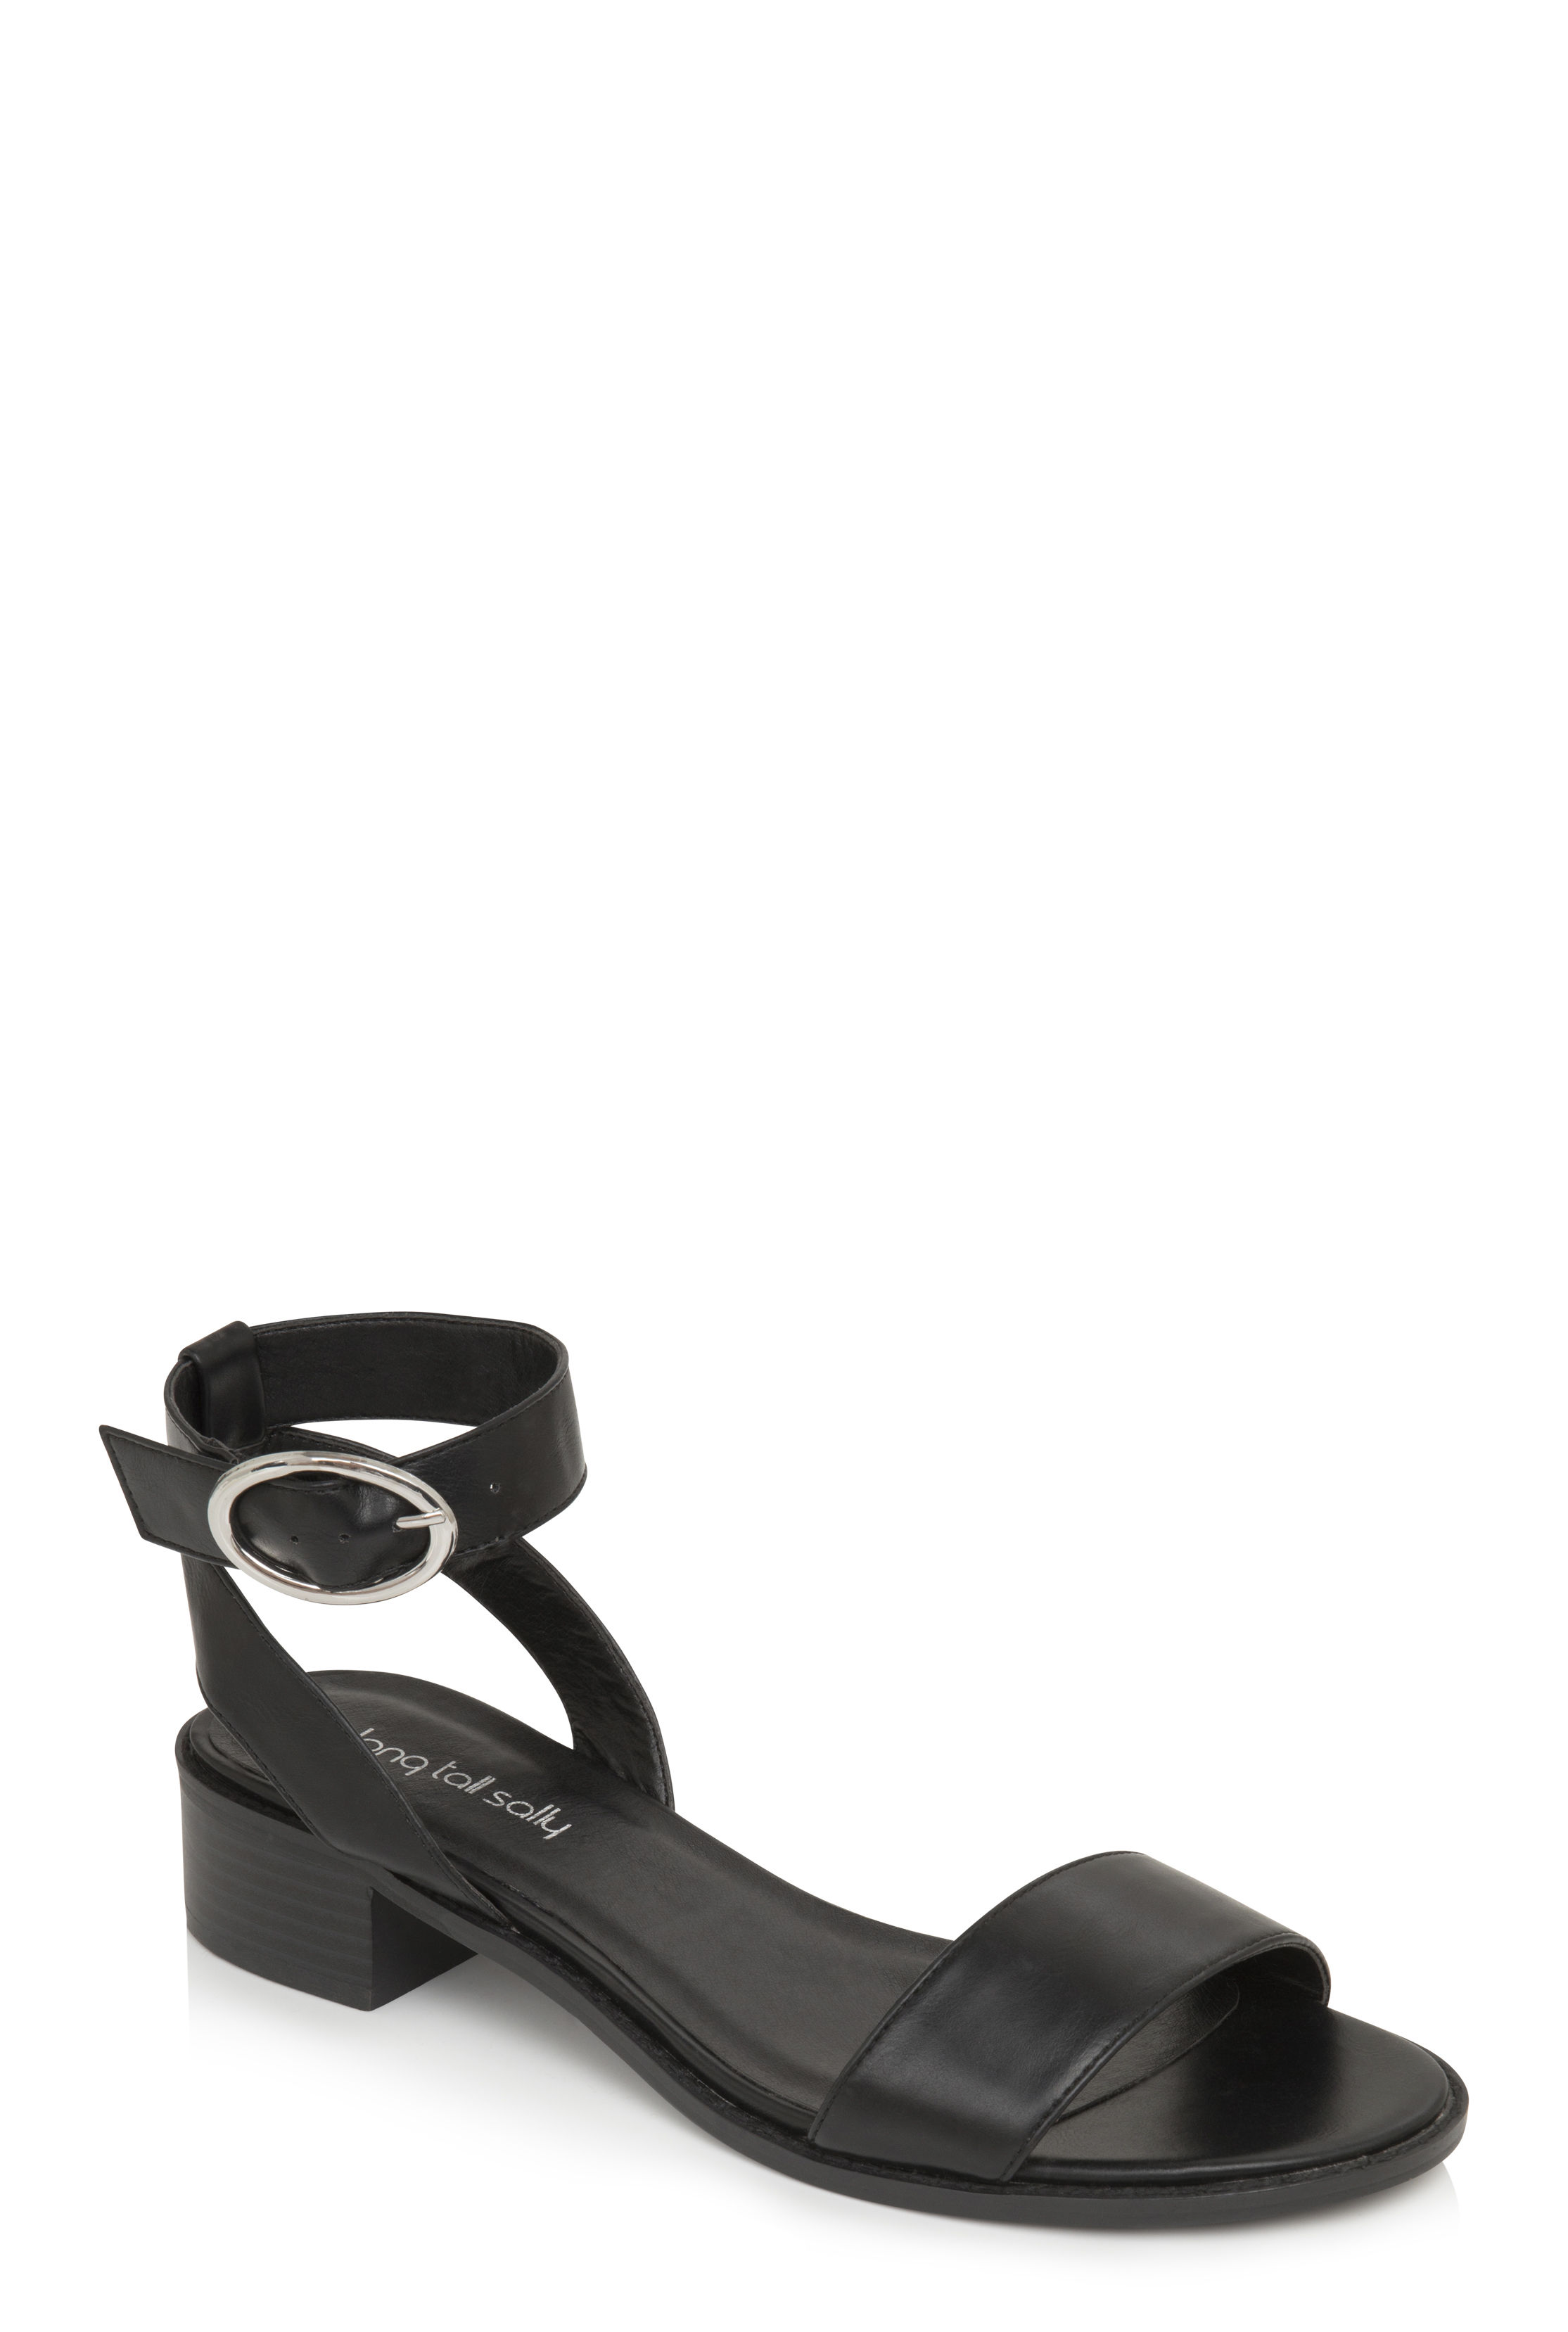 LTS Demi Two Part Block Heel Sandal